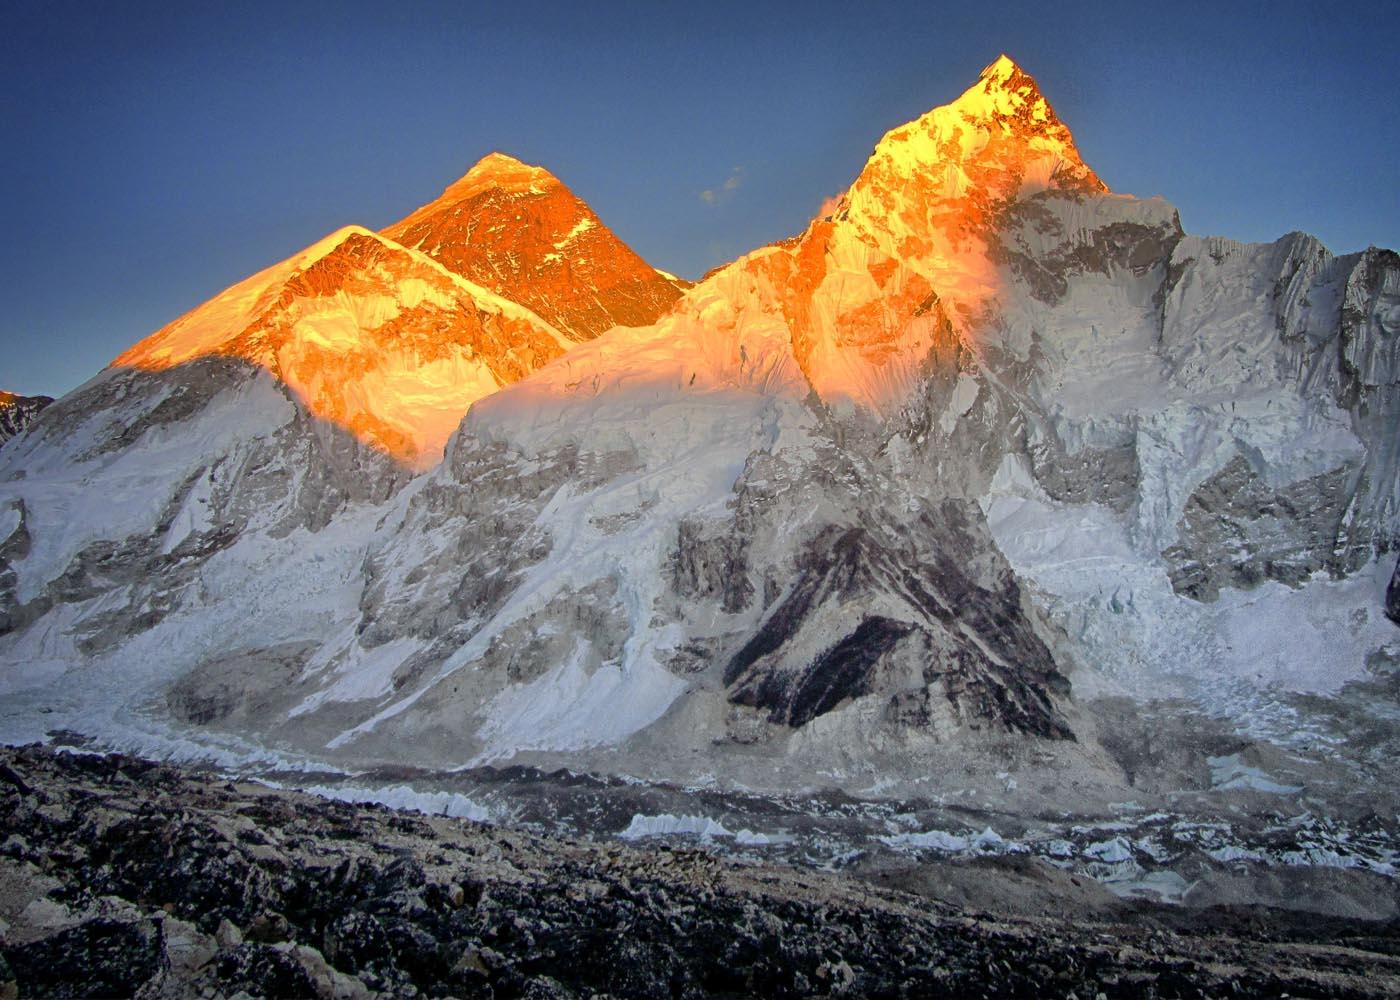 Everest Base Camp - Kathmandu Everest Region